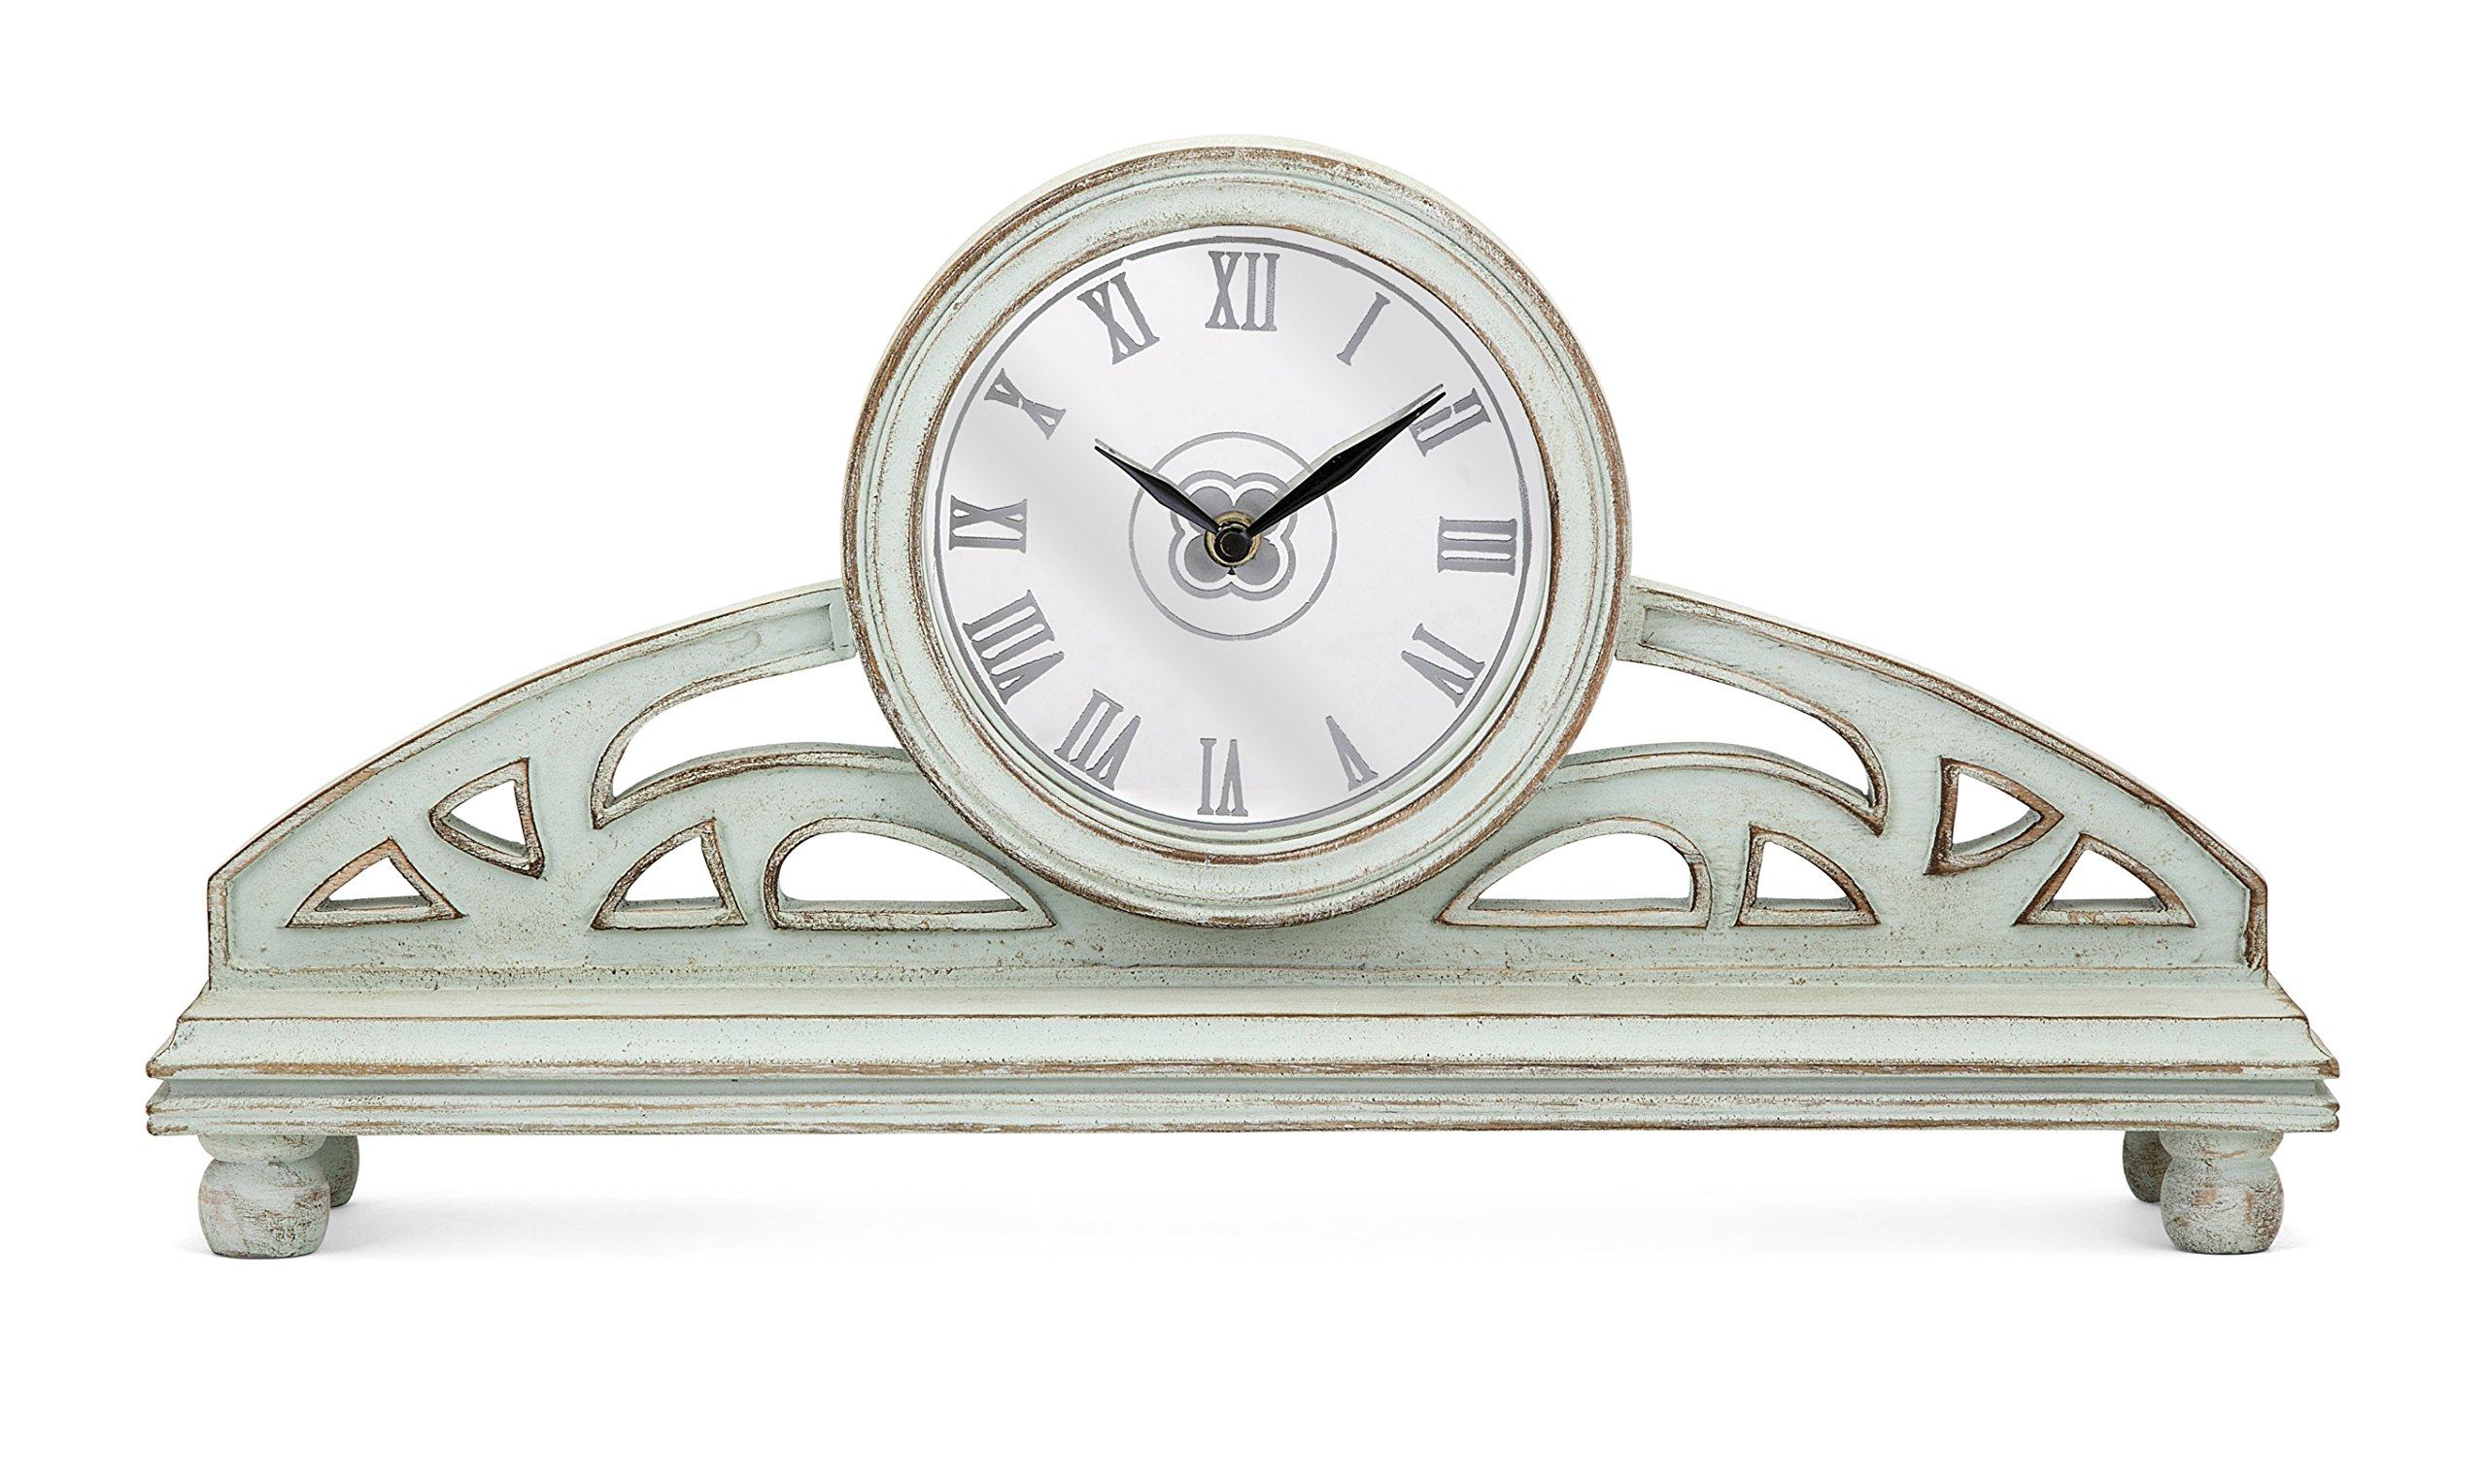 Imax Trisha Yearwood Home Collection 95914 Ty Songbird Mantel Clock Trisha Yearwood Home Songbird Mantel Clock